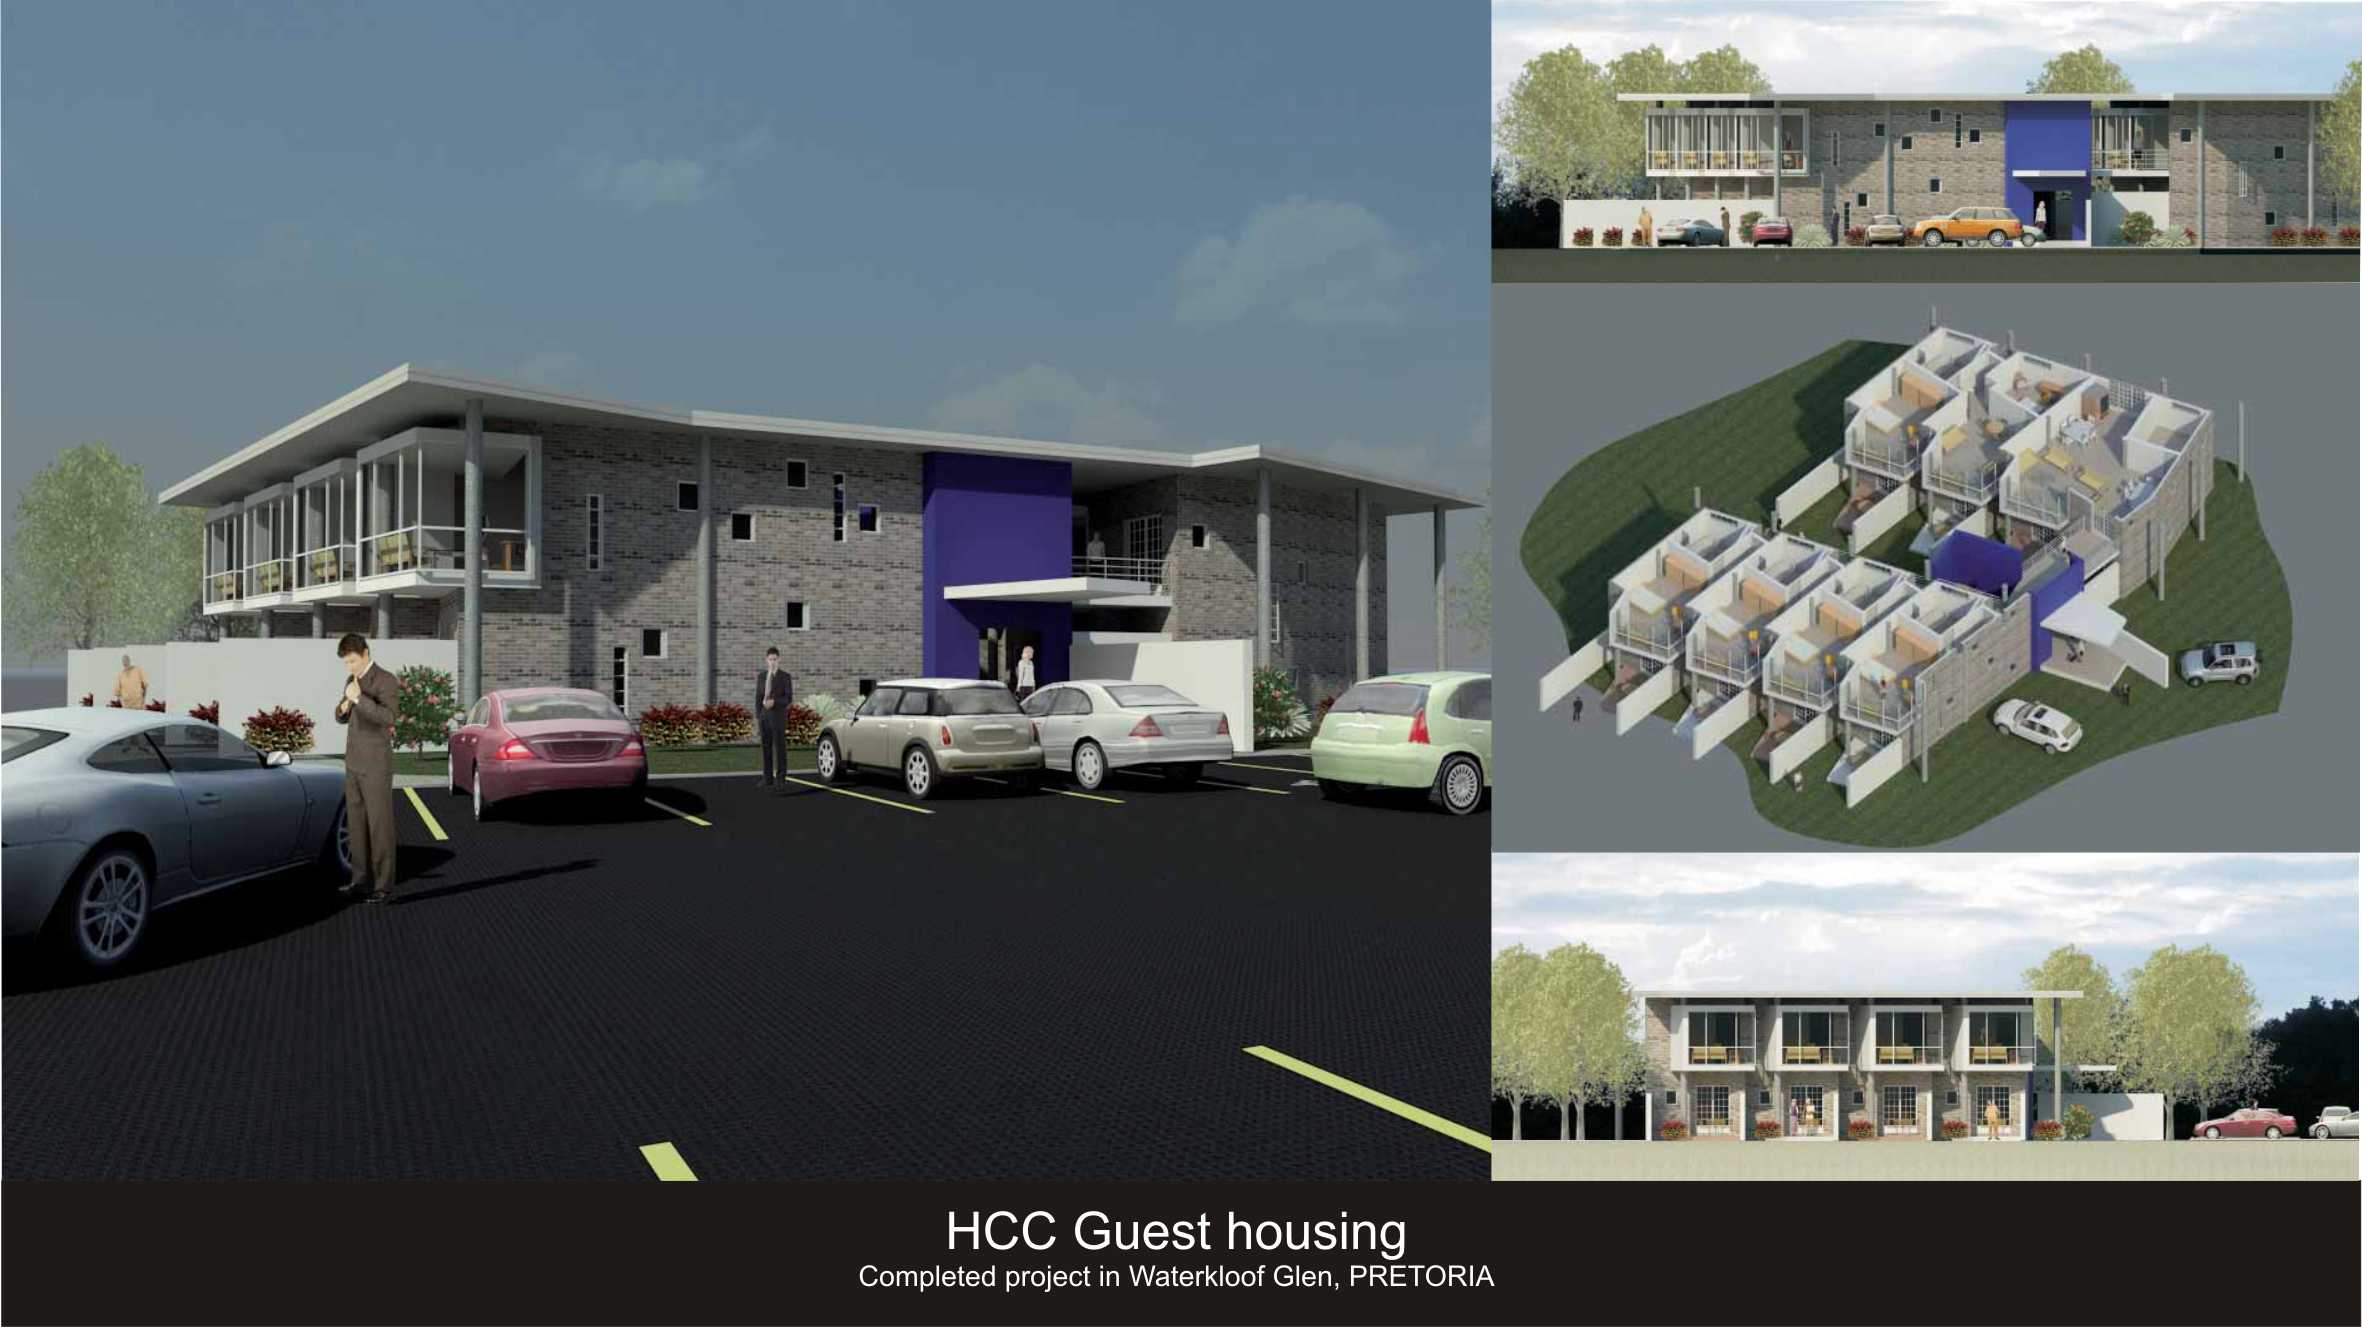 HCC Housing 3.JPG